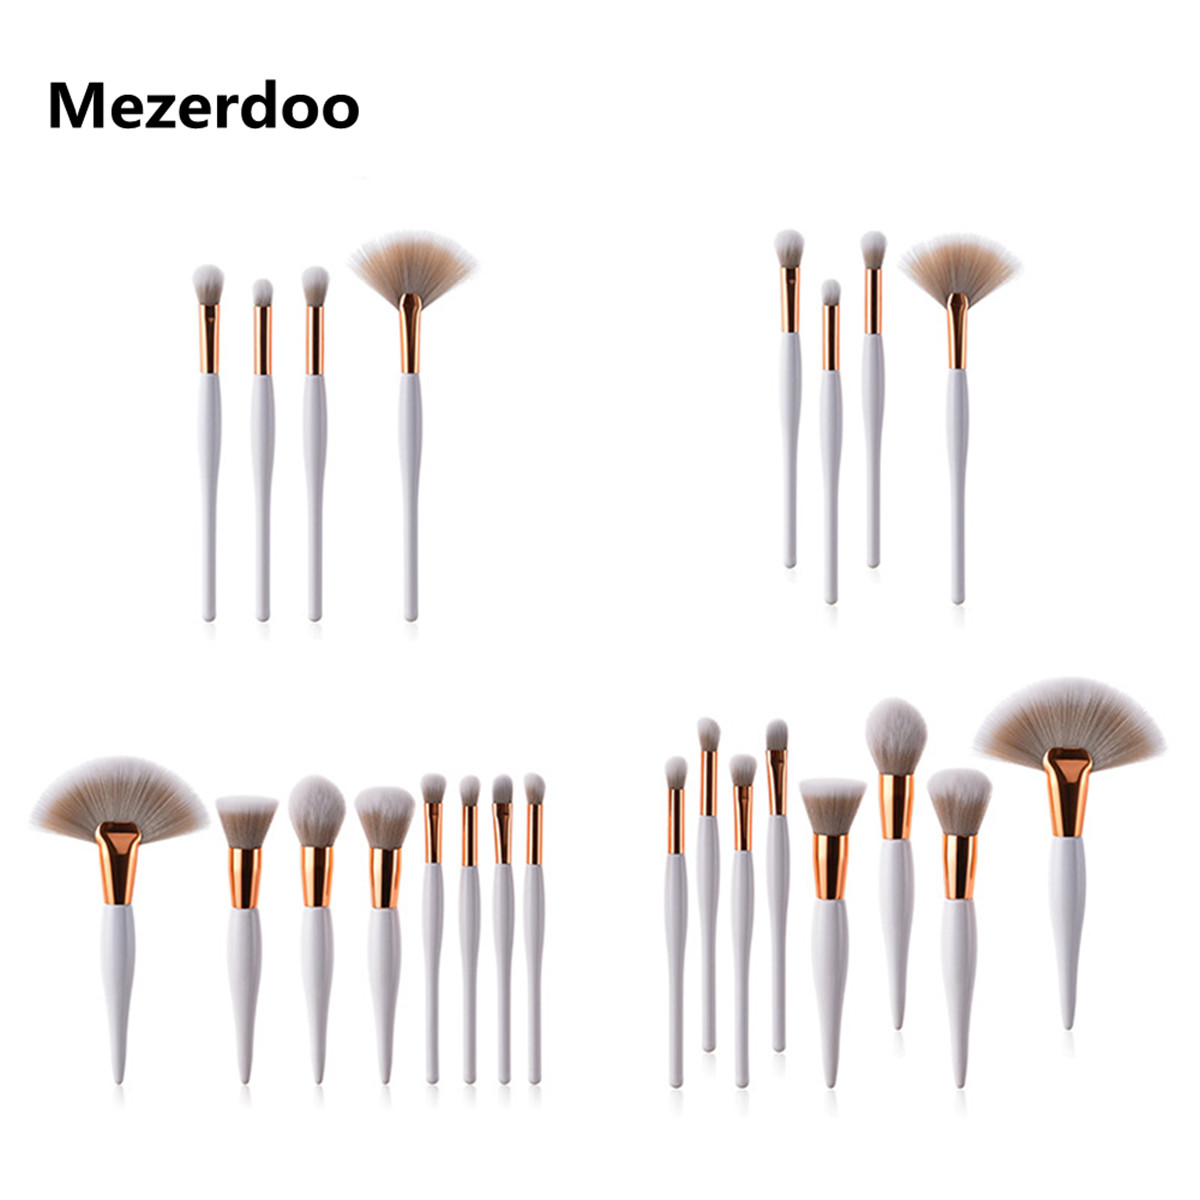 Tesoura de Maquiagem 4/8 pcs branco handle chubby Estilo : Cosmetic Brush Blusher